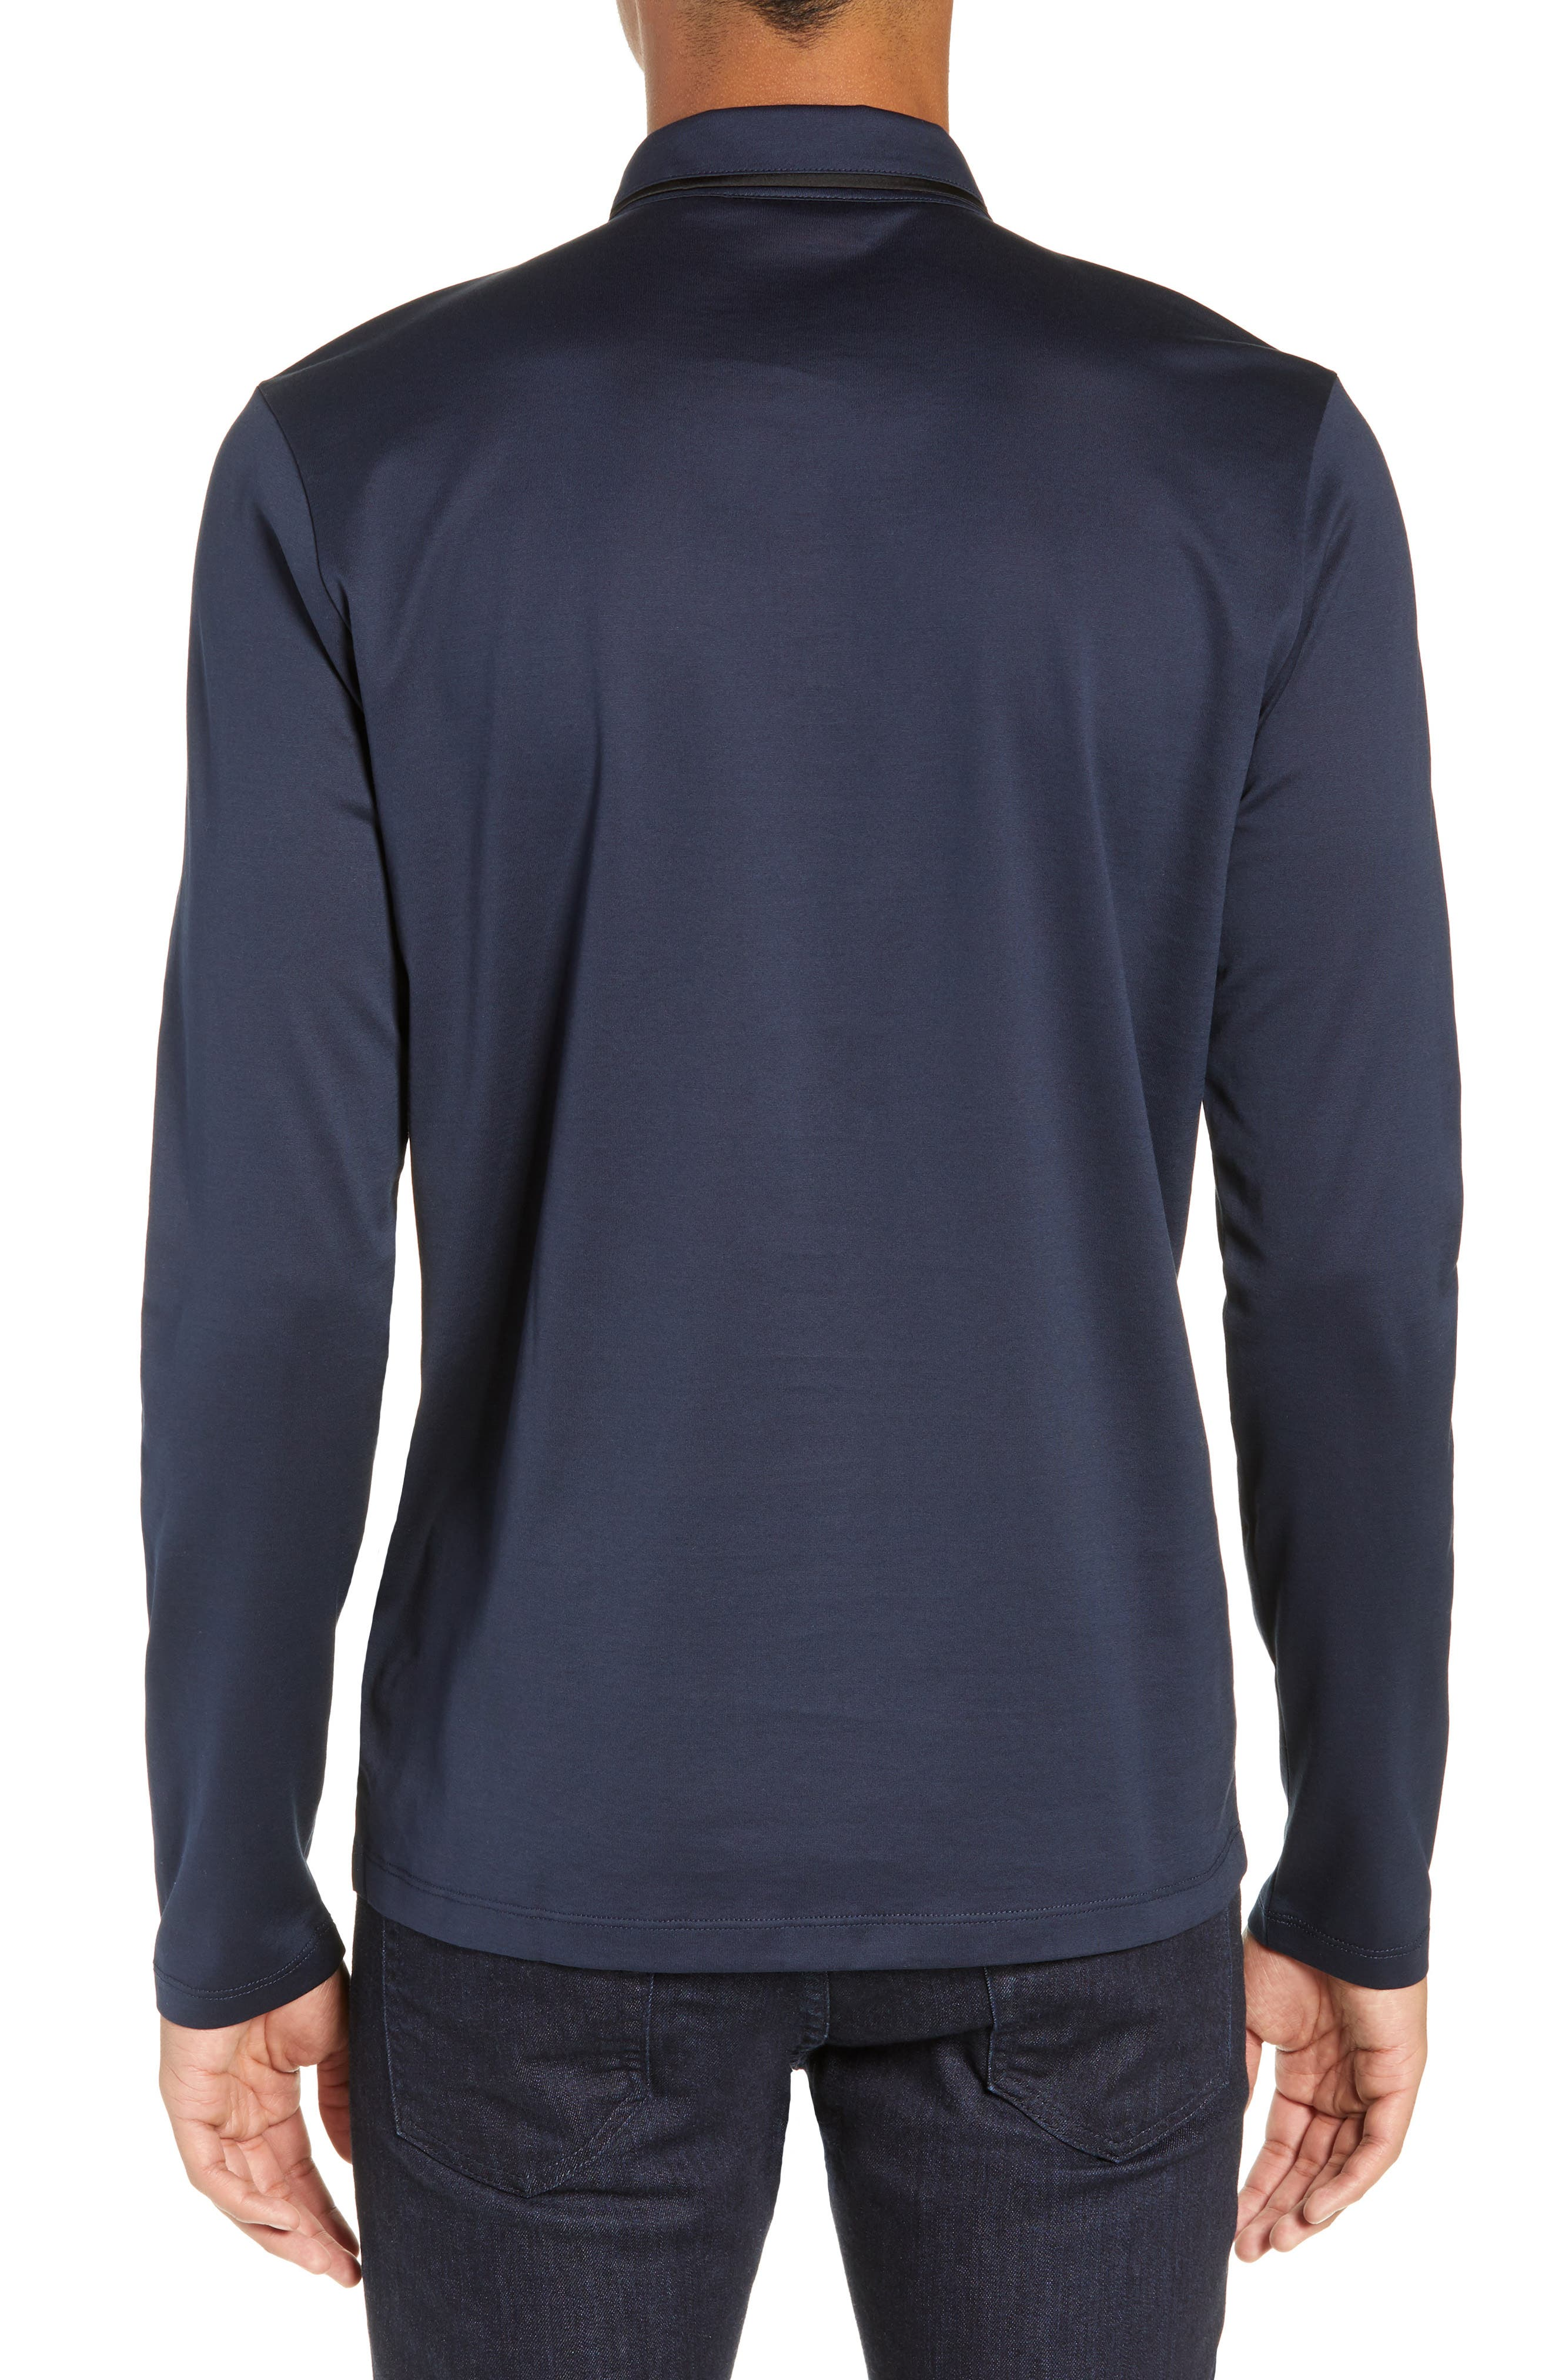 Dalendar Mercerized Cotton Slim Fit Polo Shirt,                             Alternate thumbnail 2, color,                             BLUE